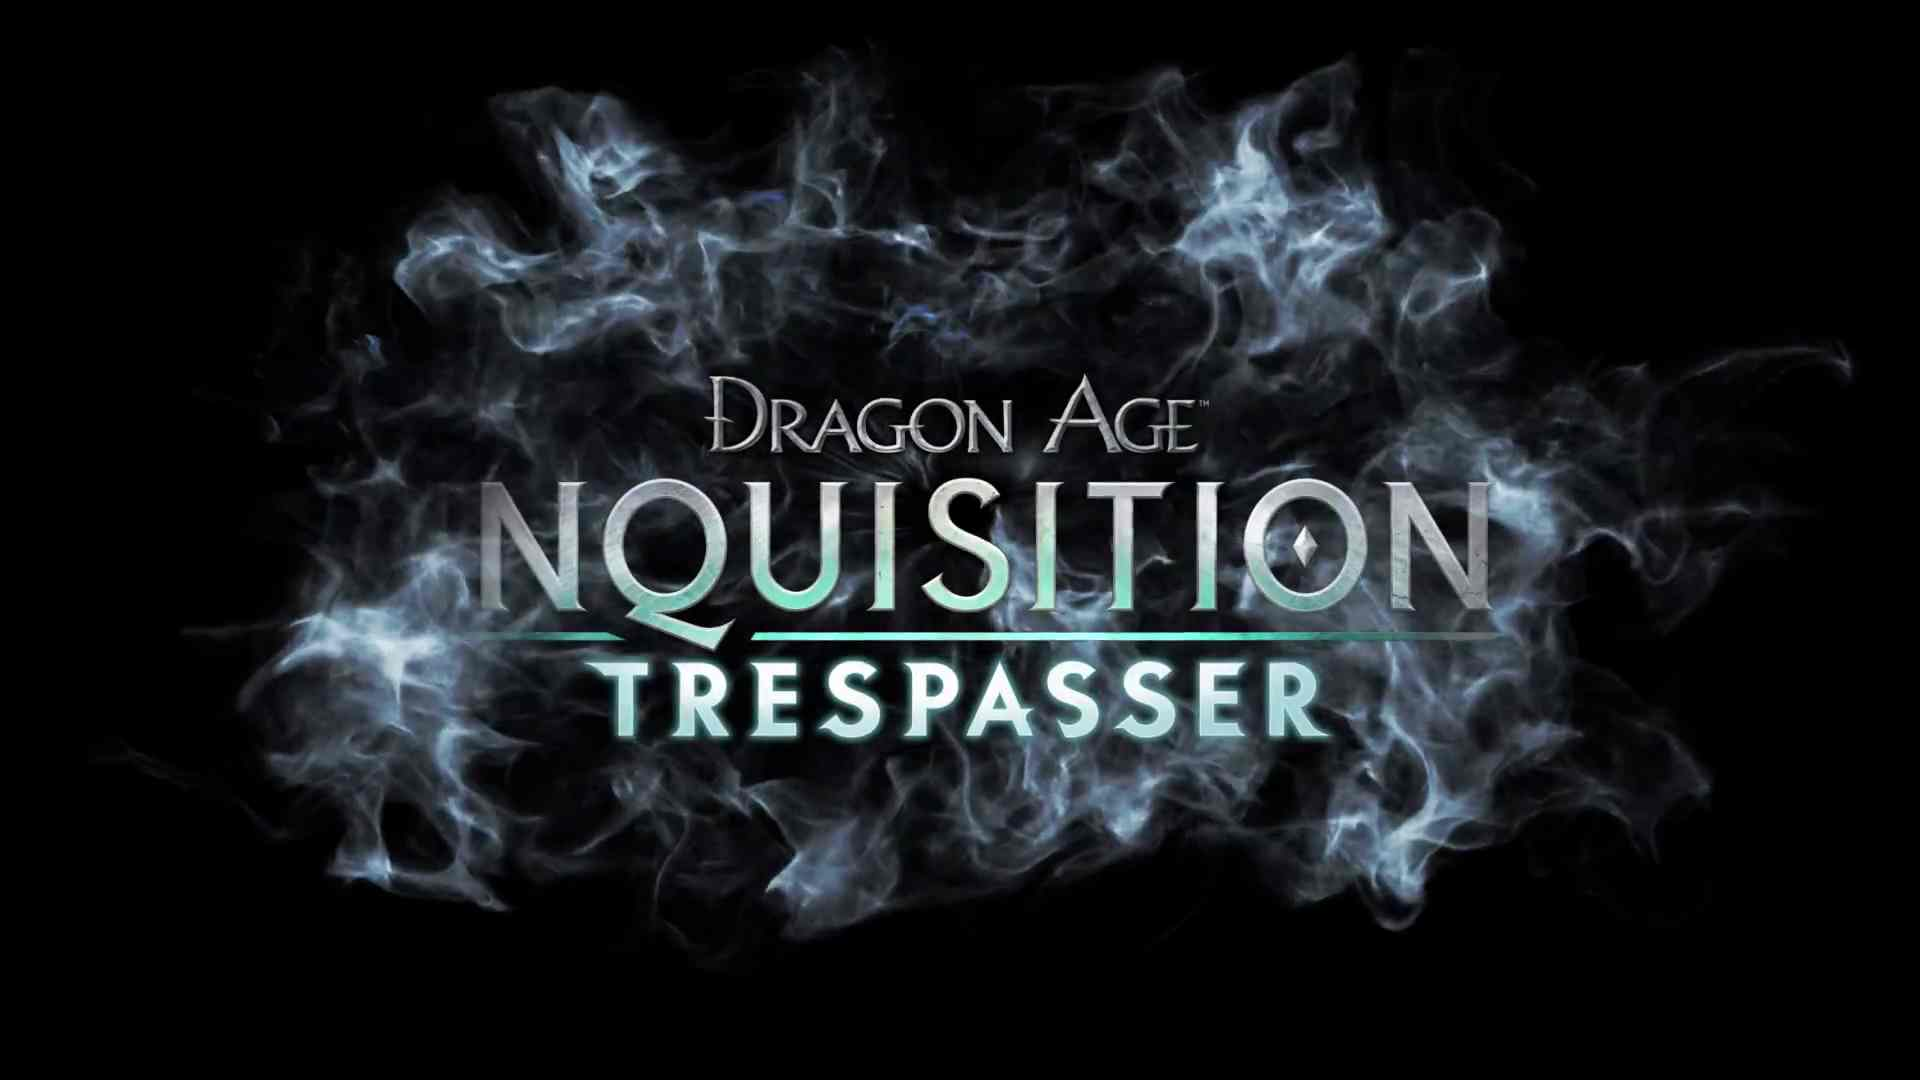 Dragon Age: Inquisition presenta su tercer DLC, Trespasser